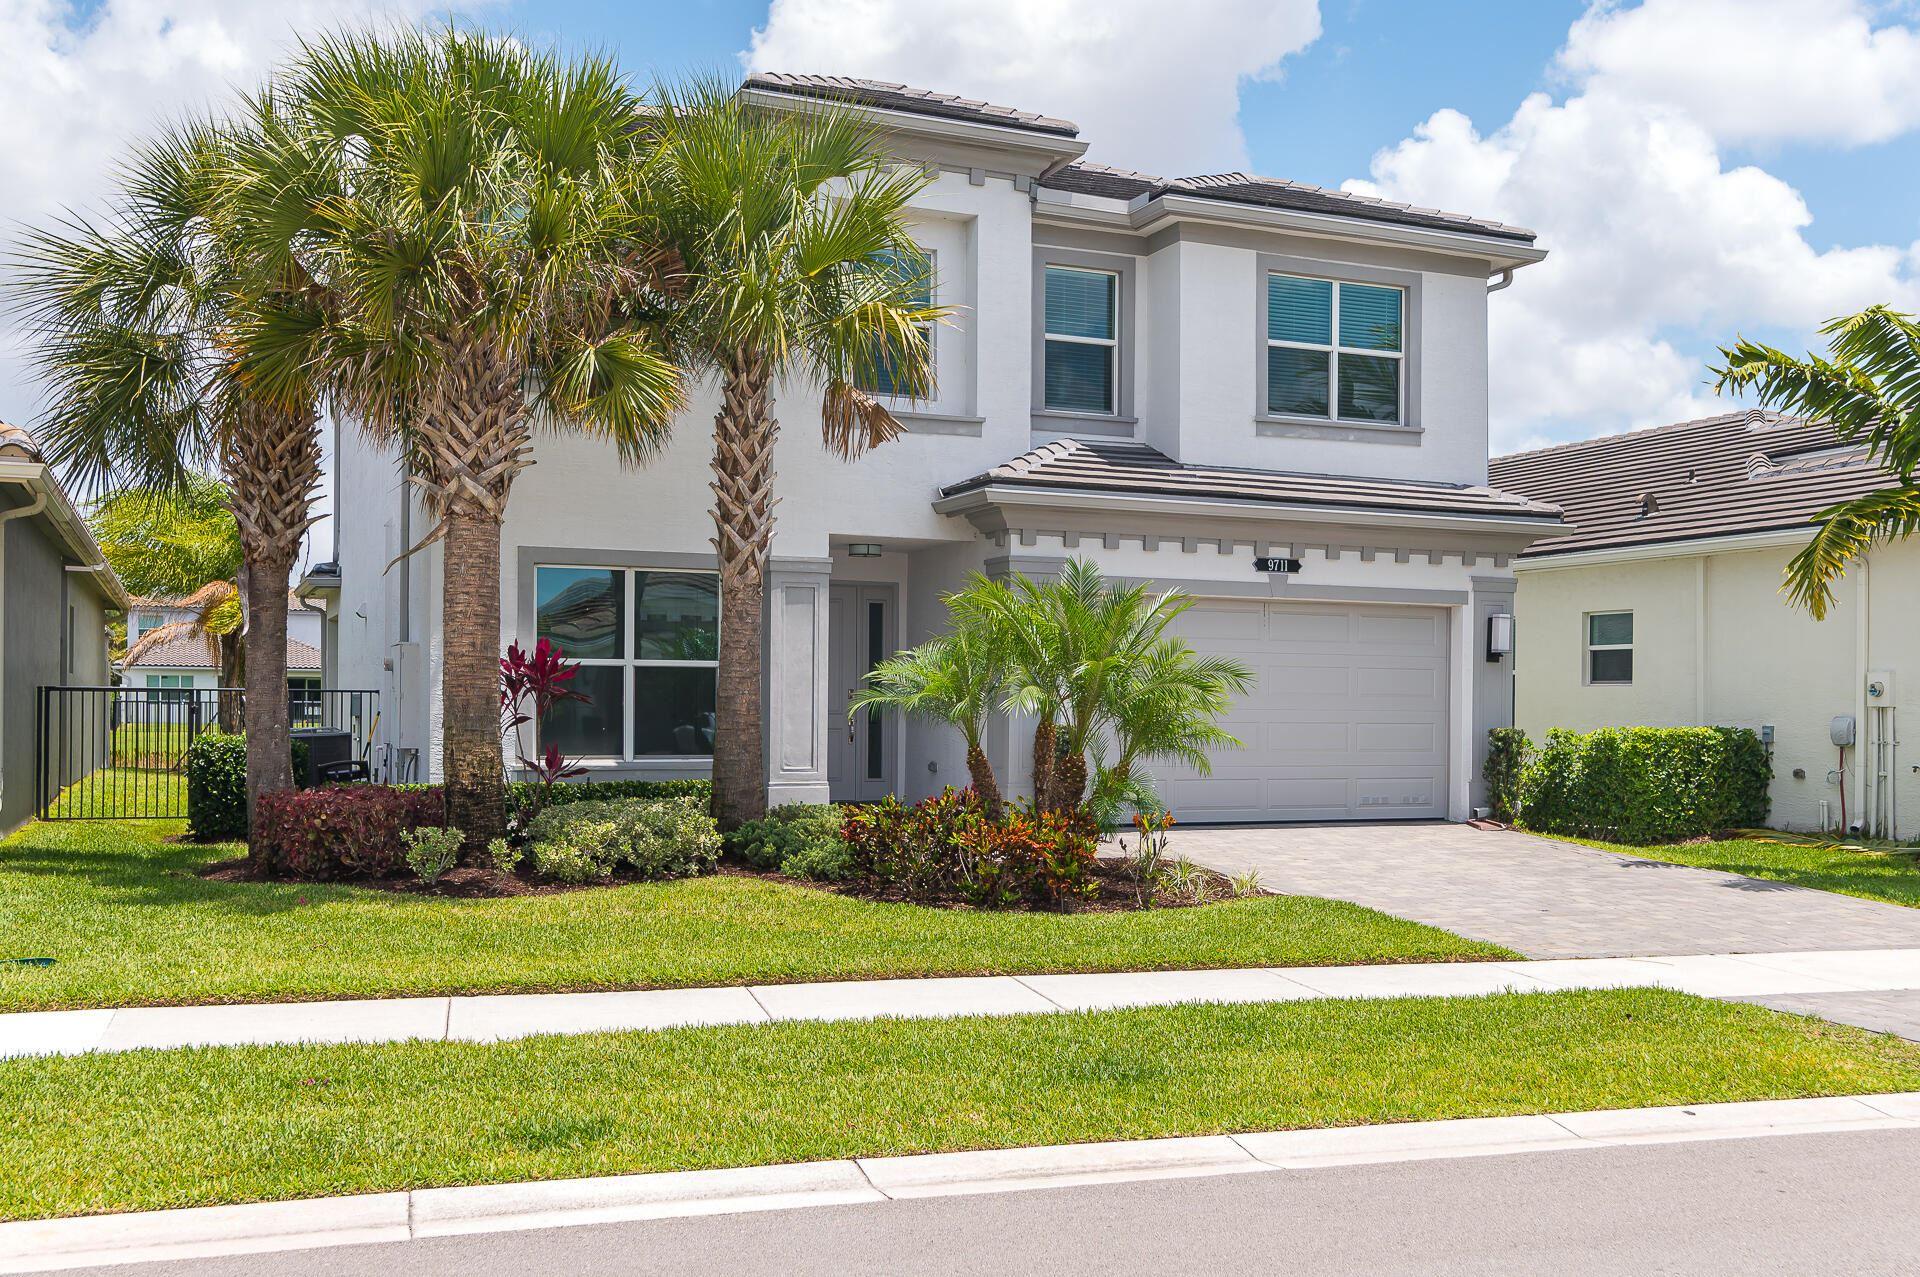 9711 Celtic Sea Lane, Delray Beach, FL 33446 - MLS#: RX-10718331